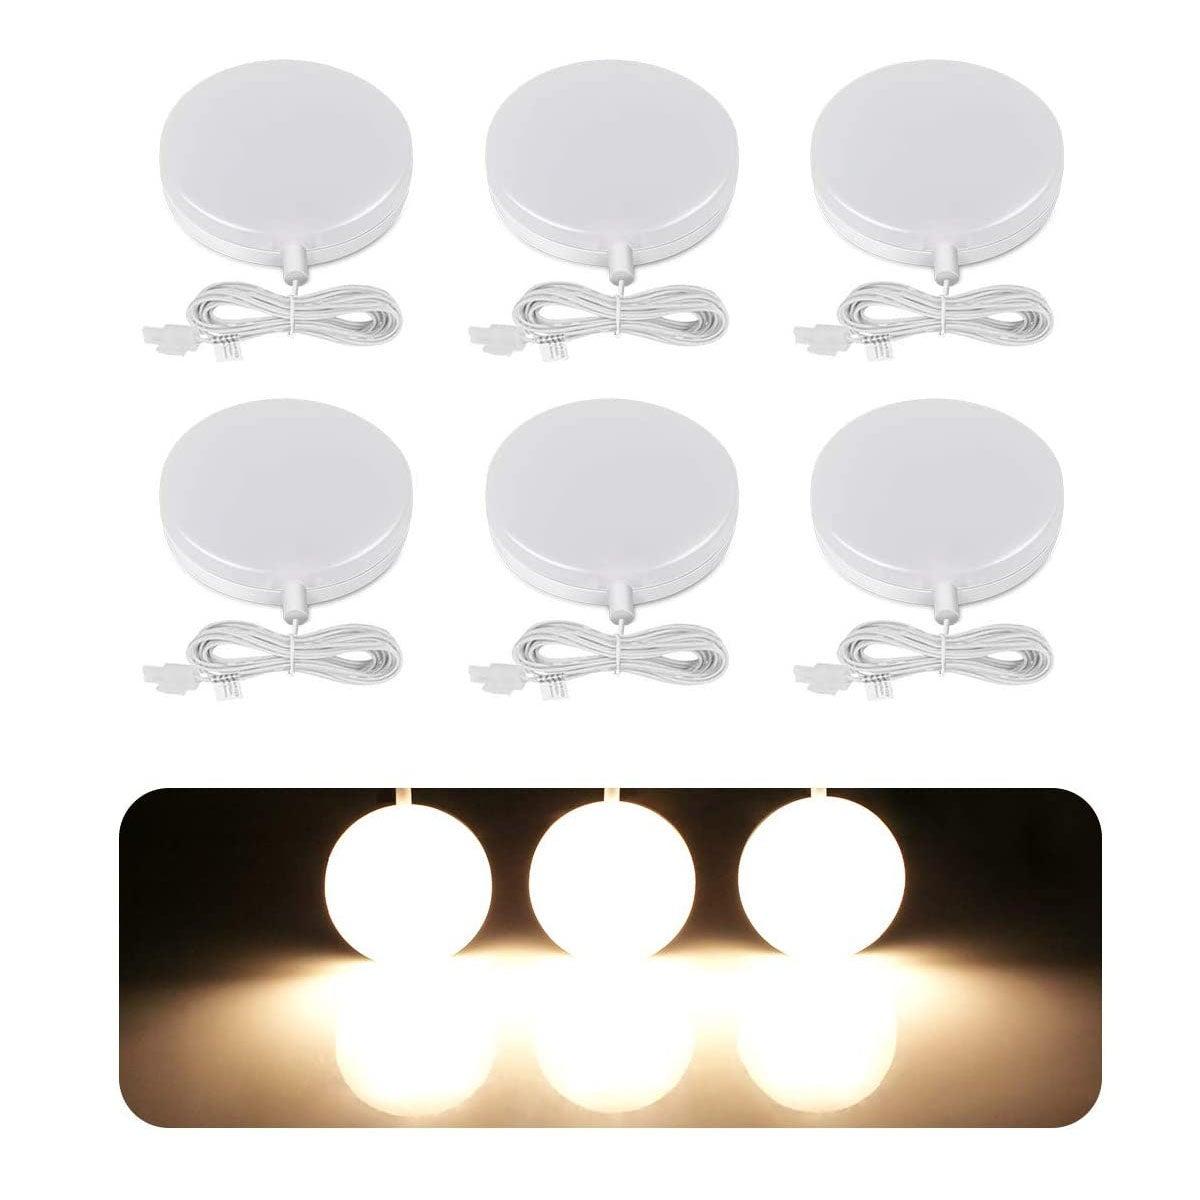 The Best Under Cabinet Lighting For Your Kitchen Bob Vila